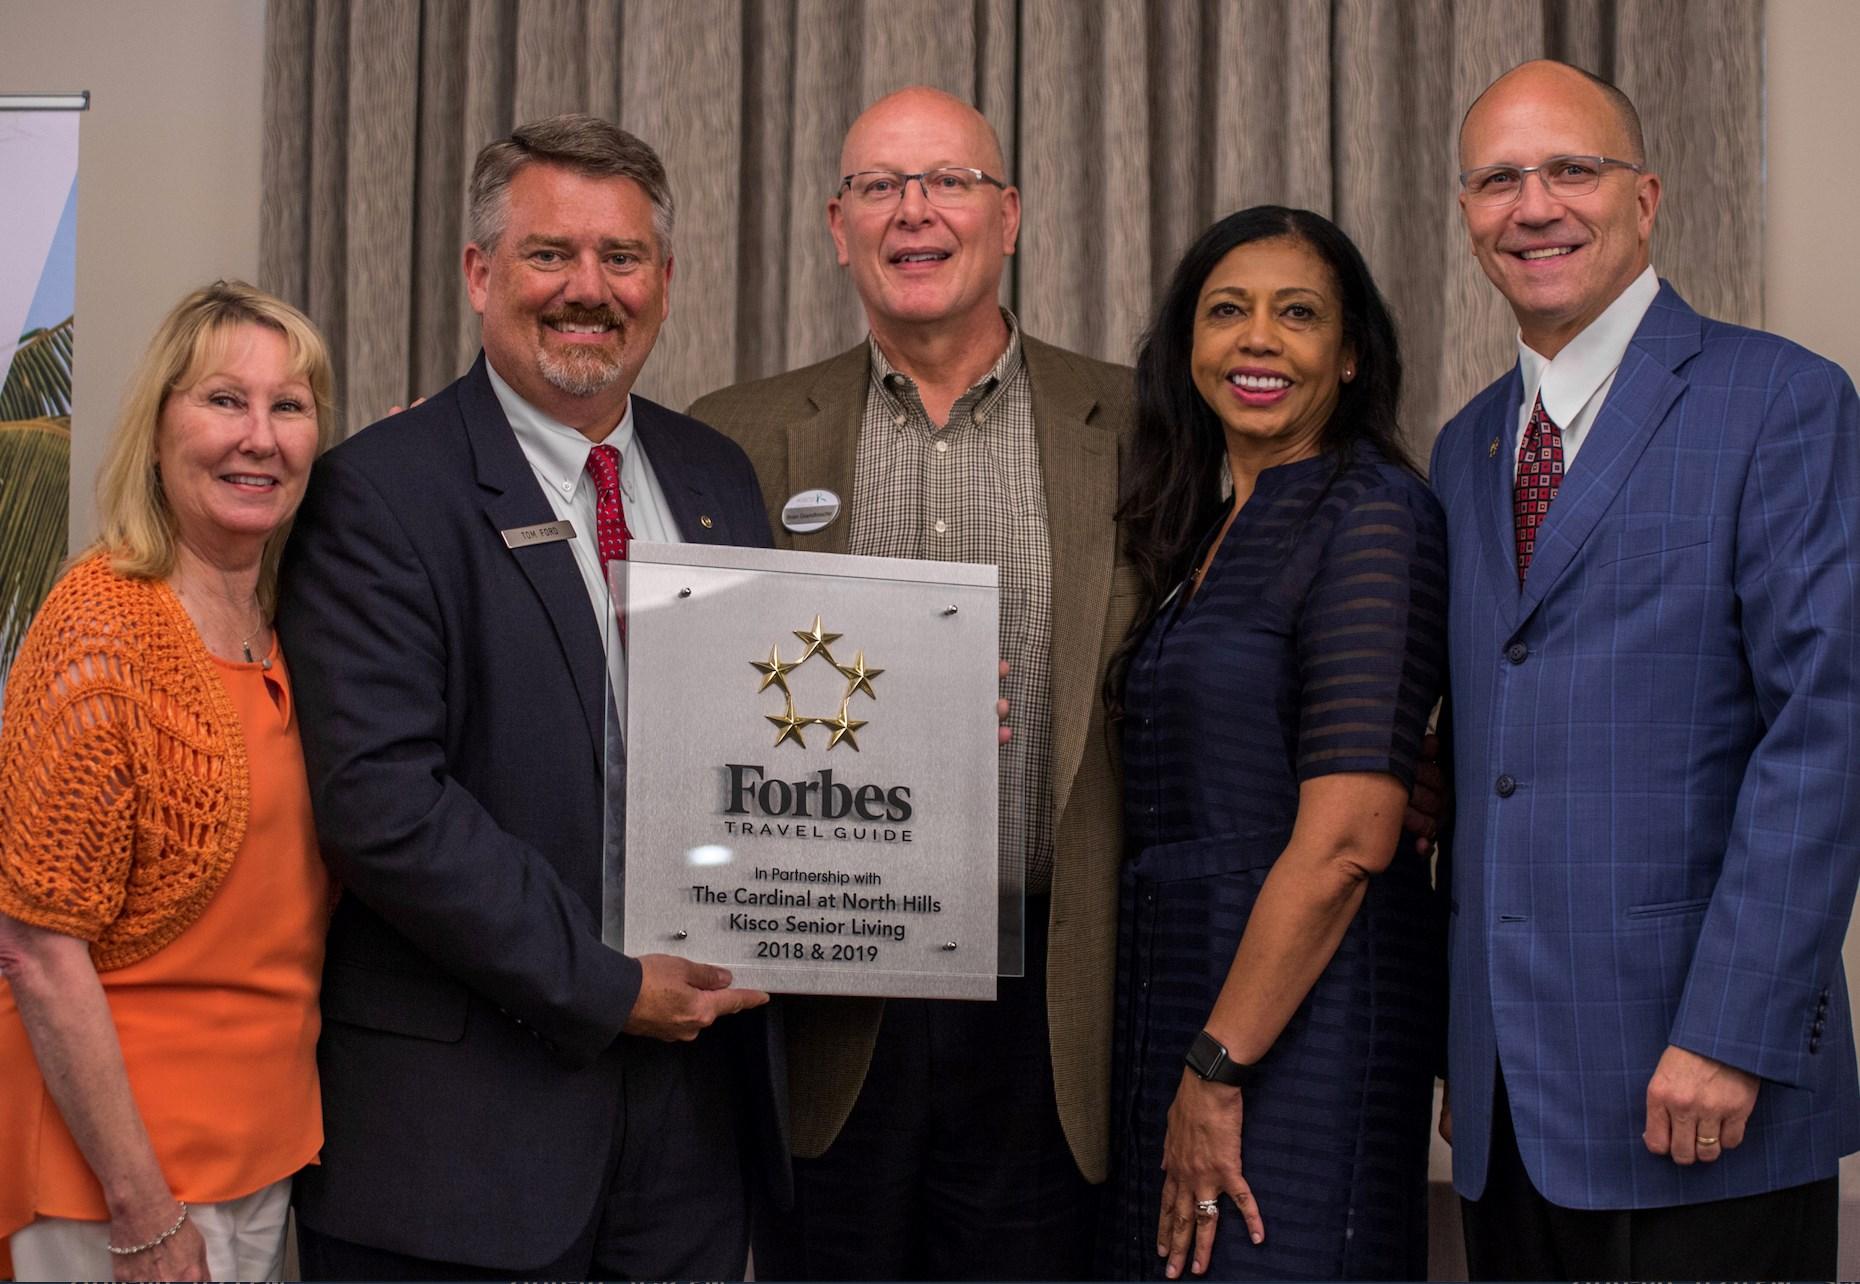 Kisco Senior Living pioneers new employee training program inspired by hospitality industry